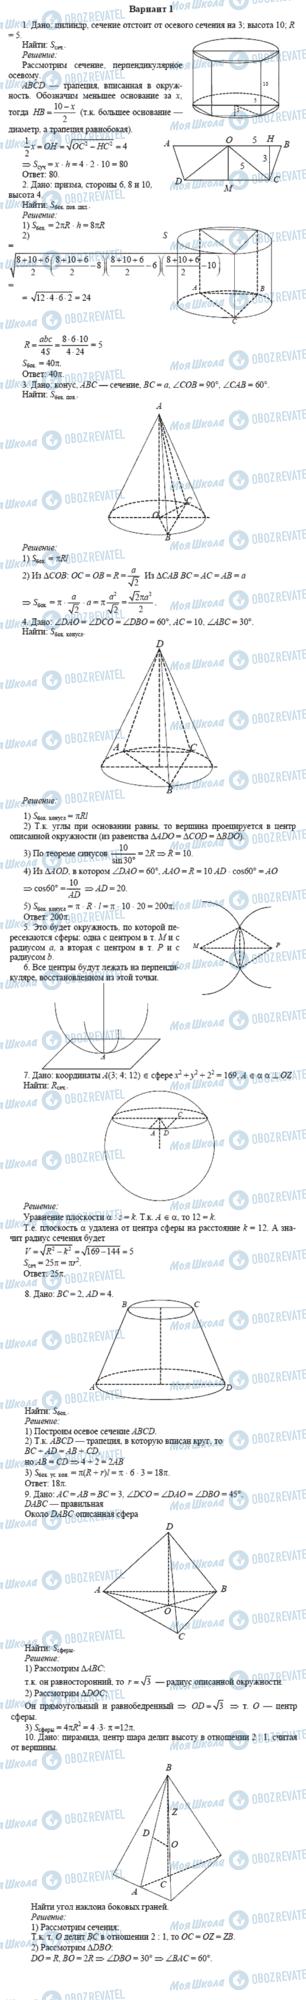 ГДЗ Геометрия 11 класс страница Вариант 1